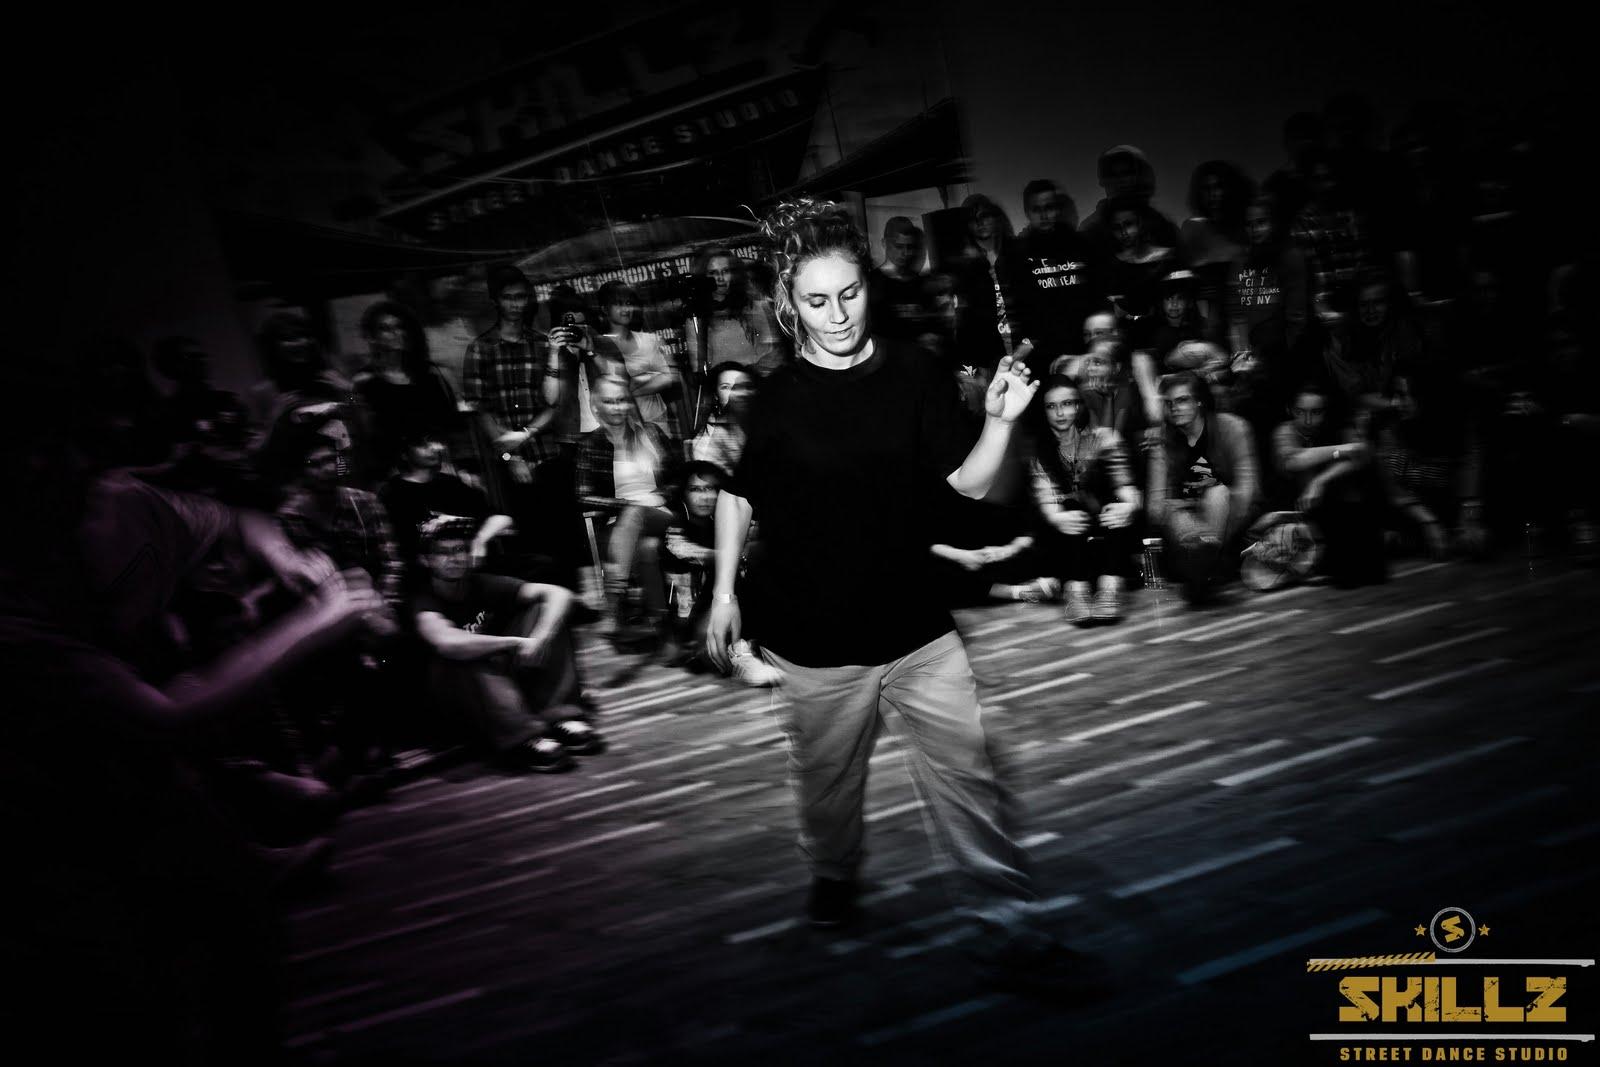 SKILLZ Halloween Jam 2012 - IMG_5302.jpg